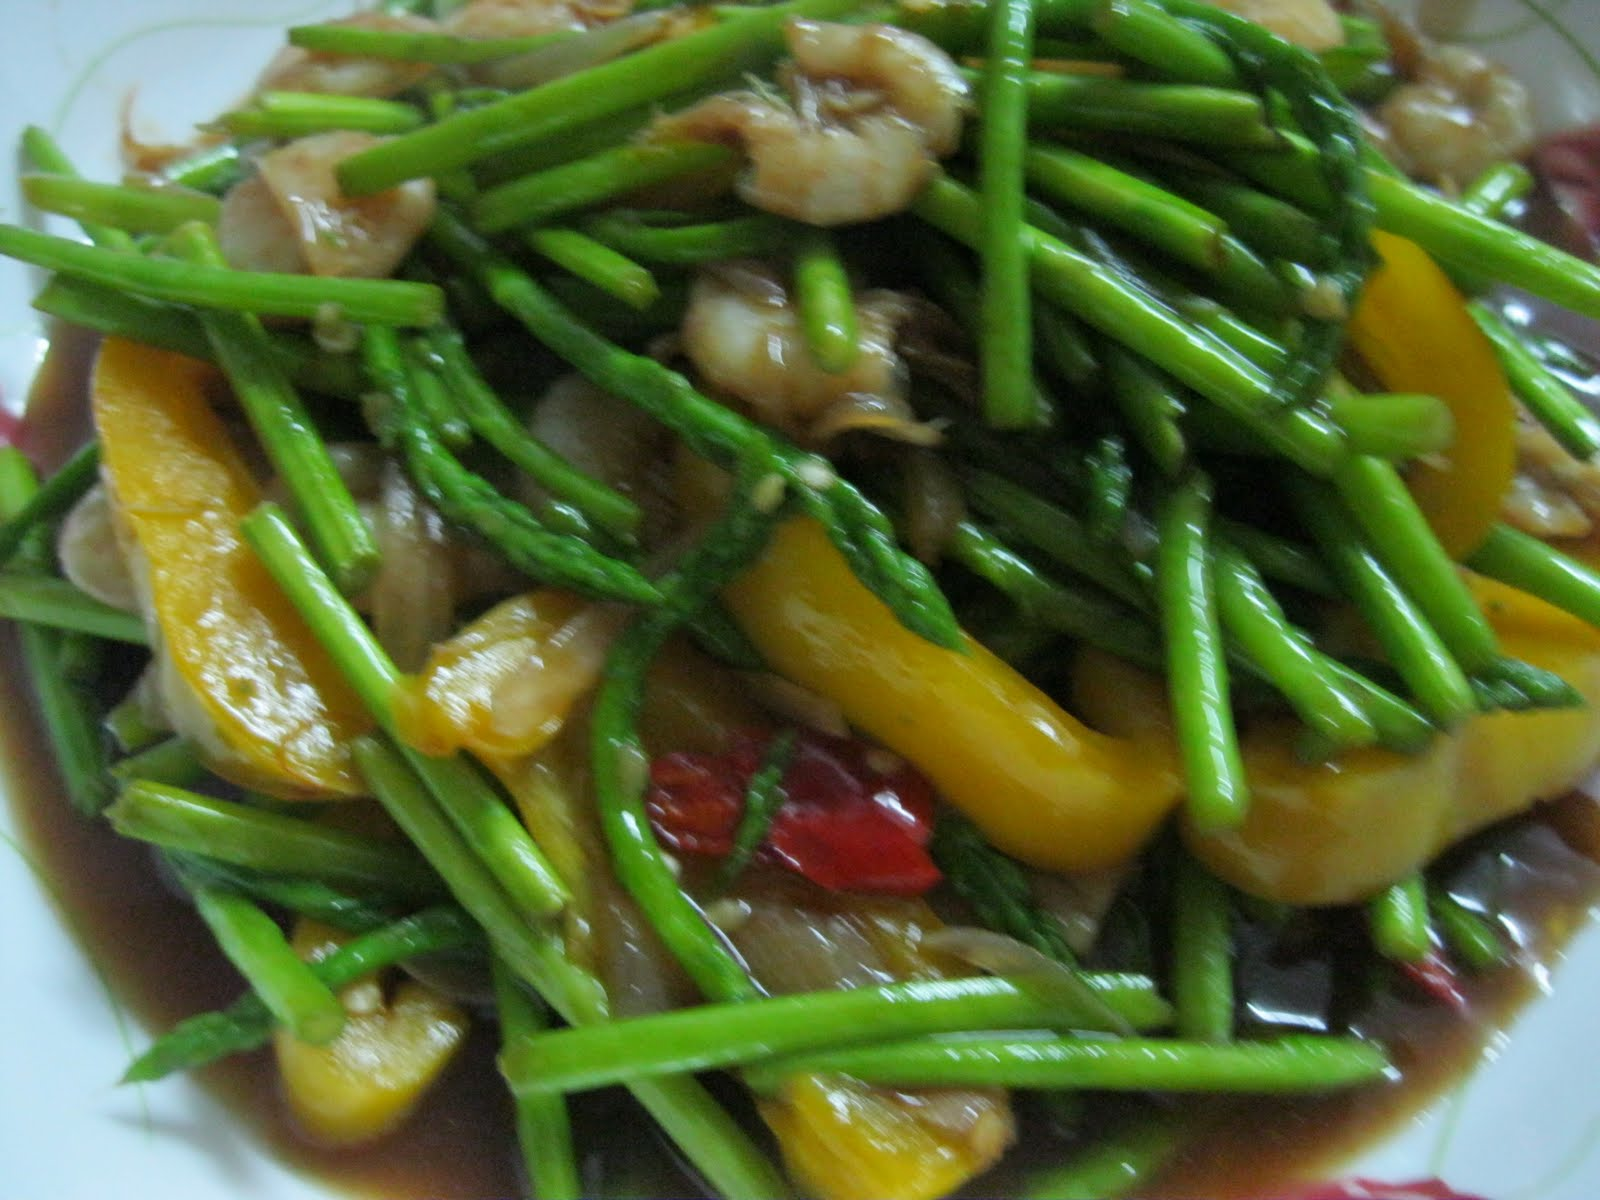 asparagus asparagus kerabu grilled asparagus asparagus stir fry ...